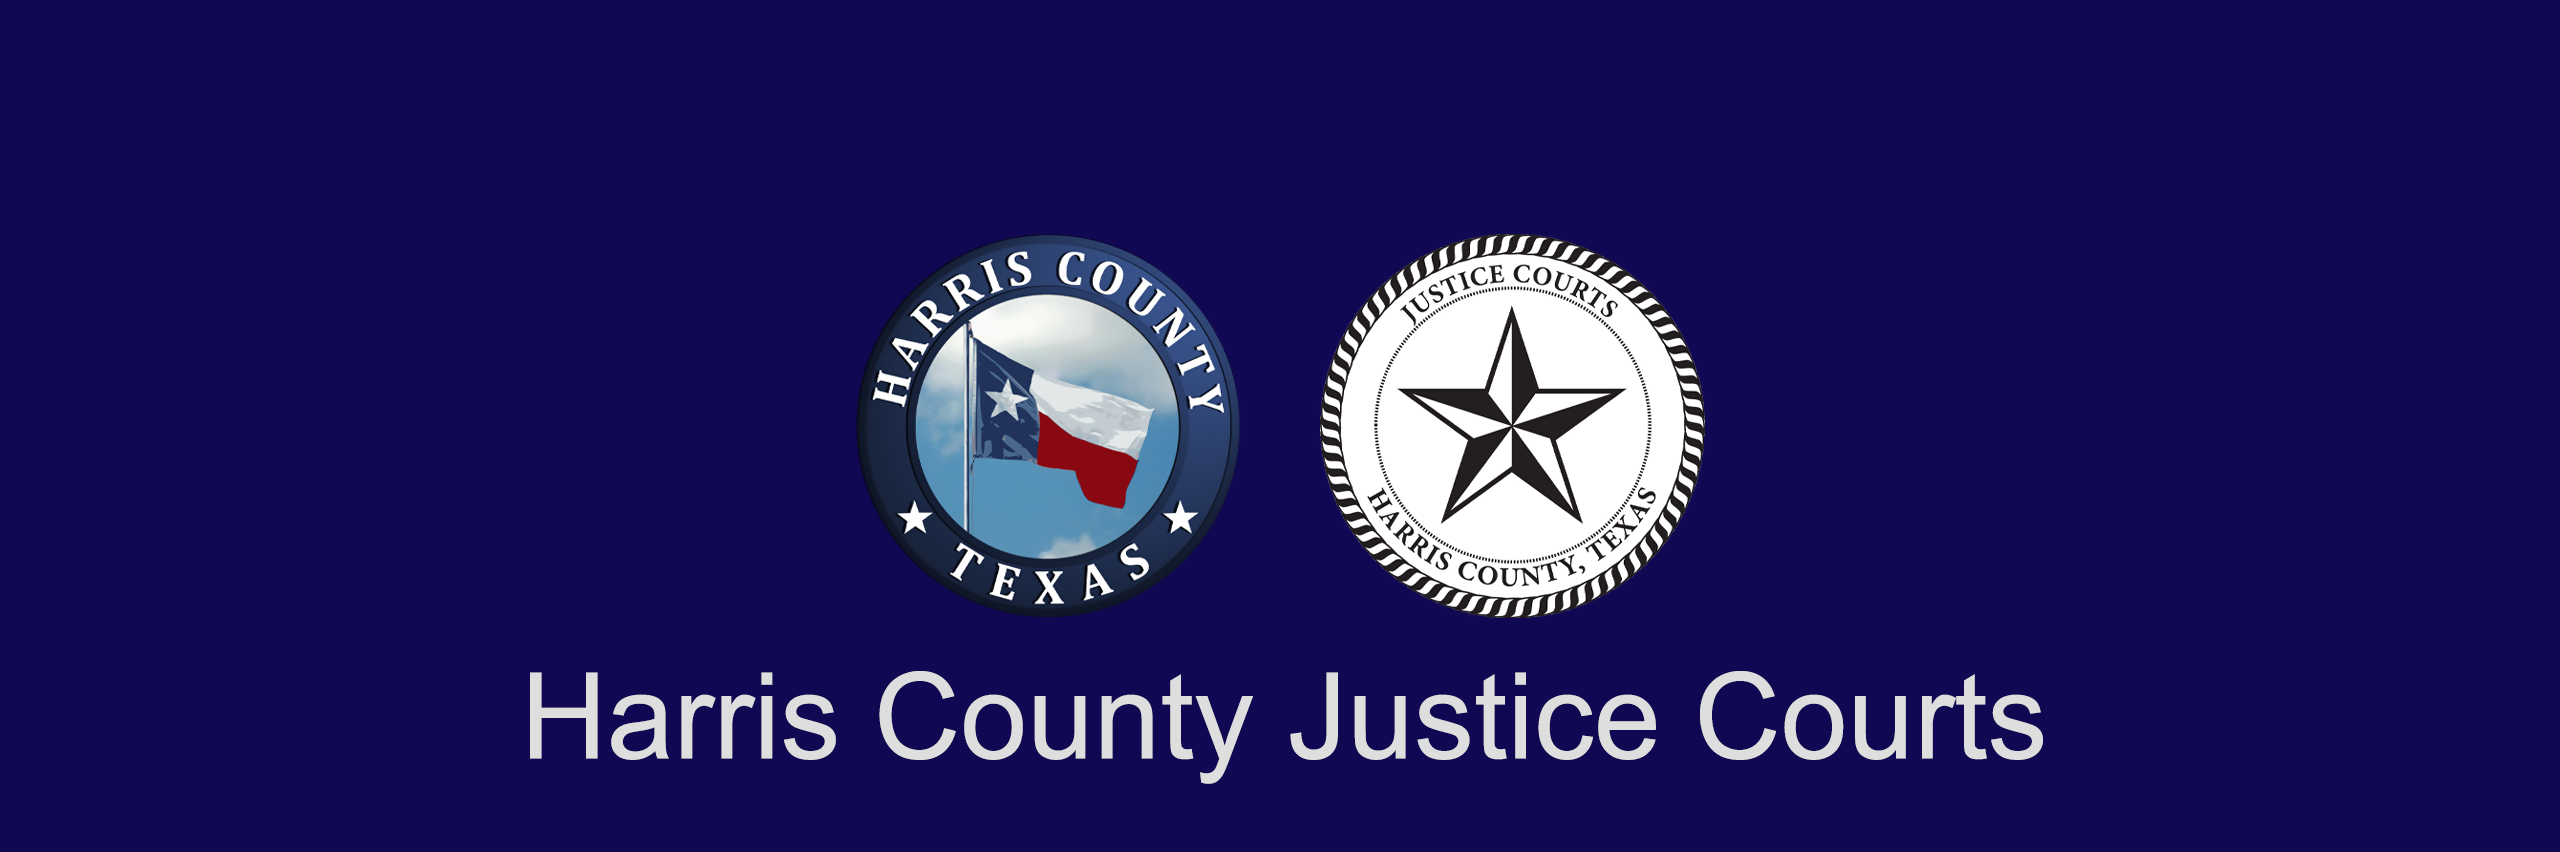 Harris County Justice Court - Precinct 2, Place 1